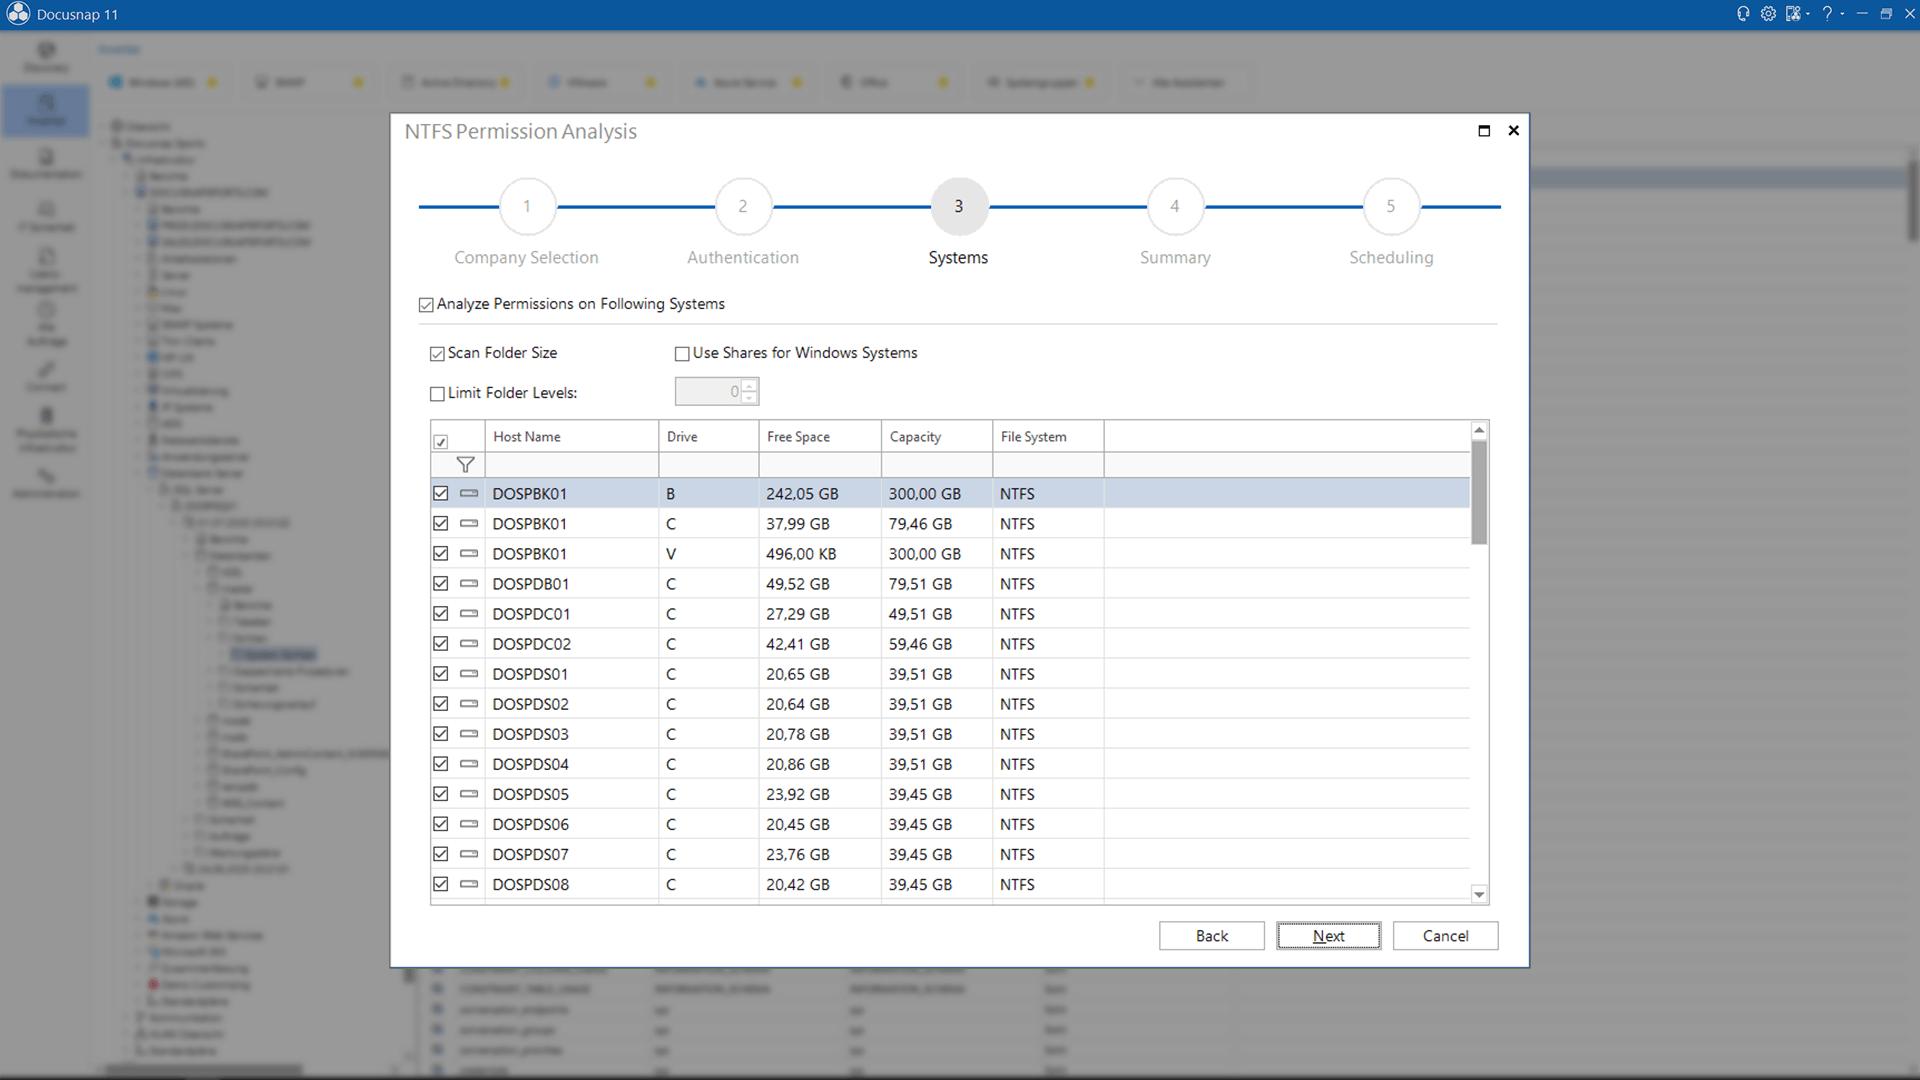 Screenshot: NTFS Permission Analysis